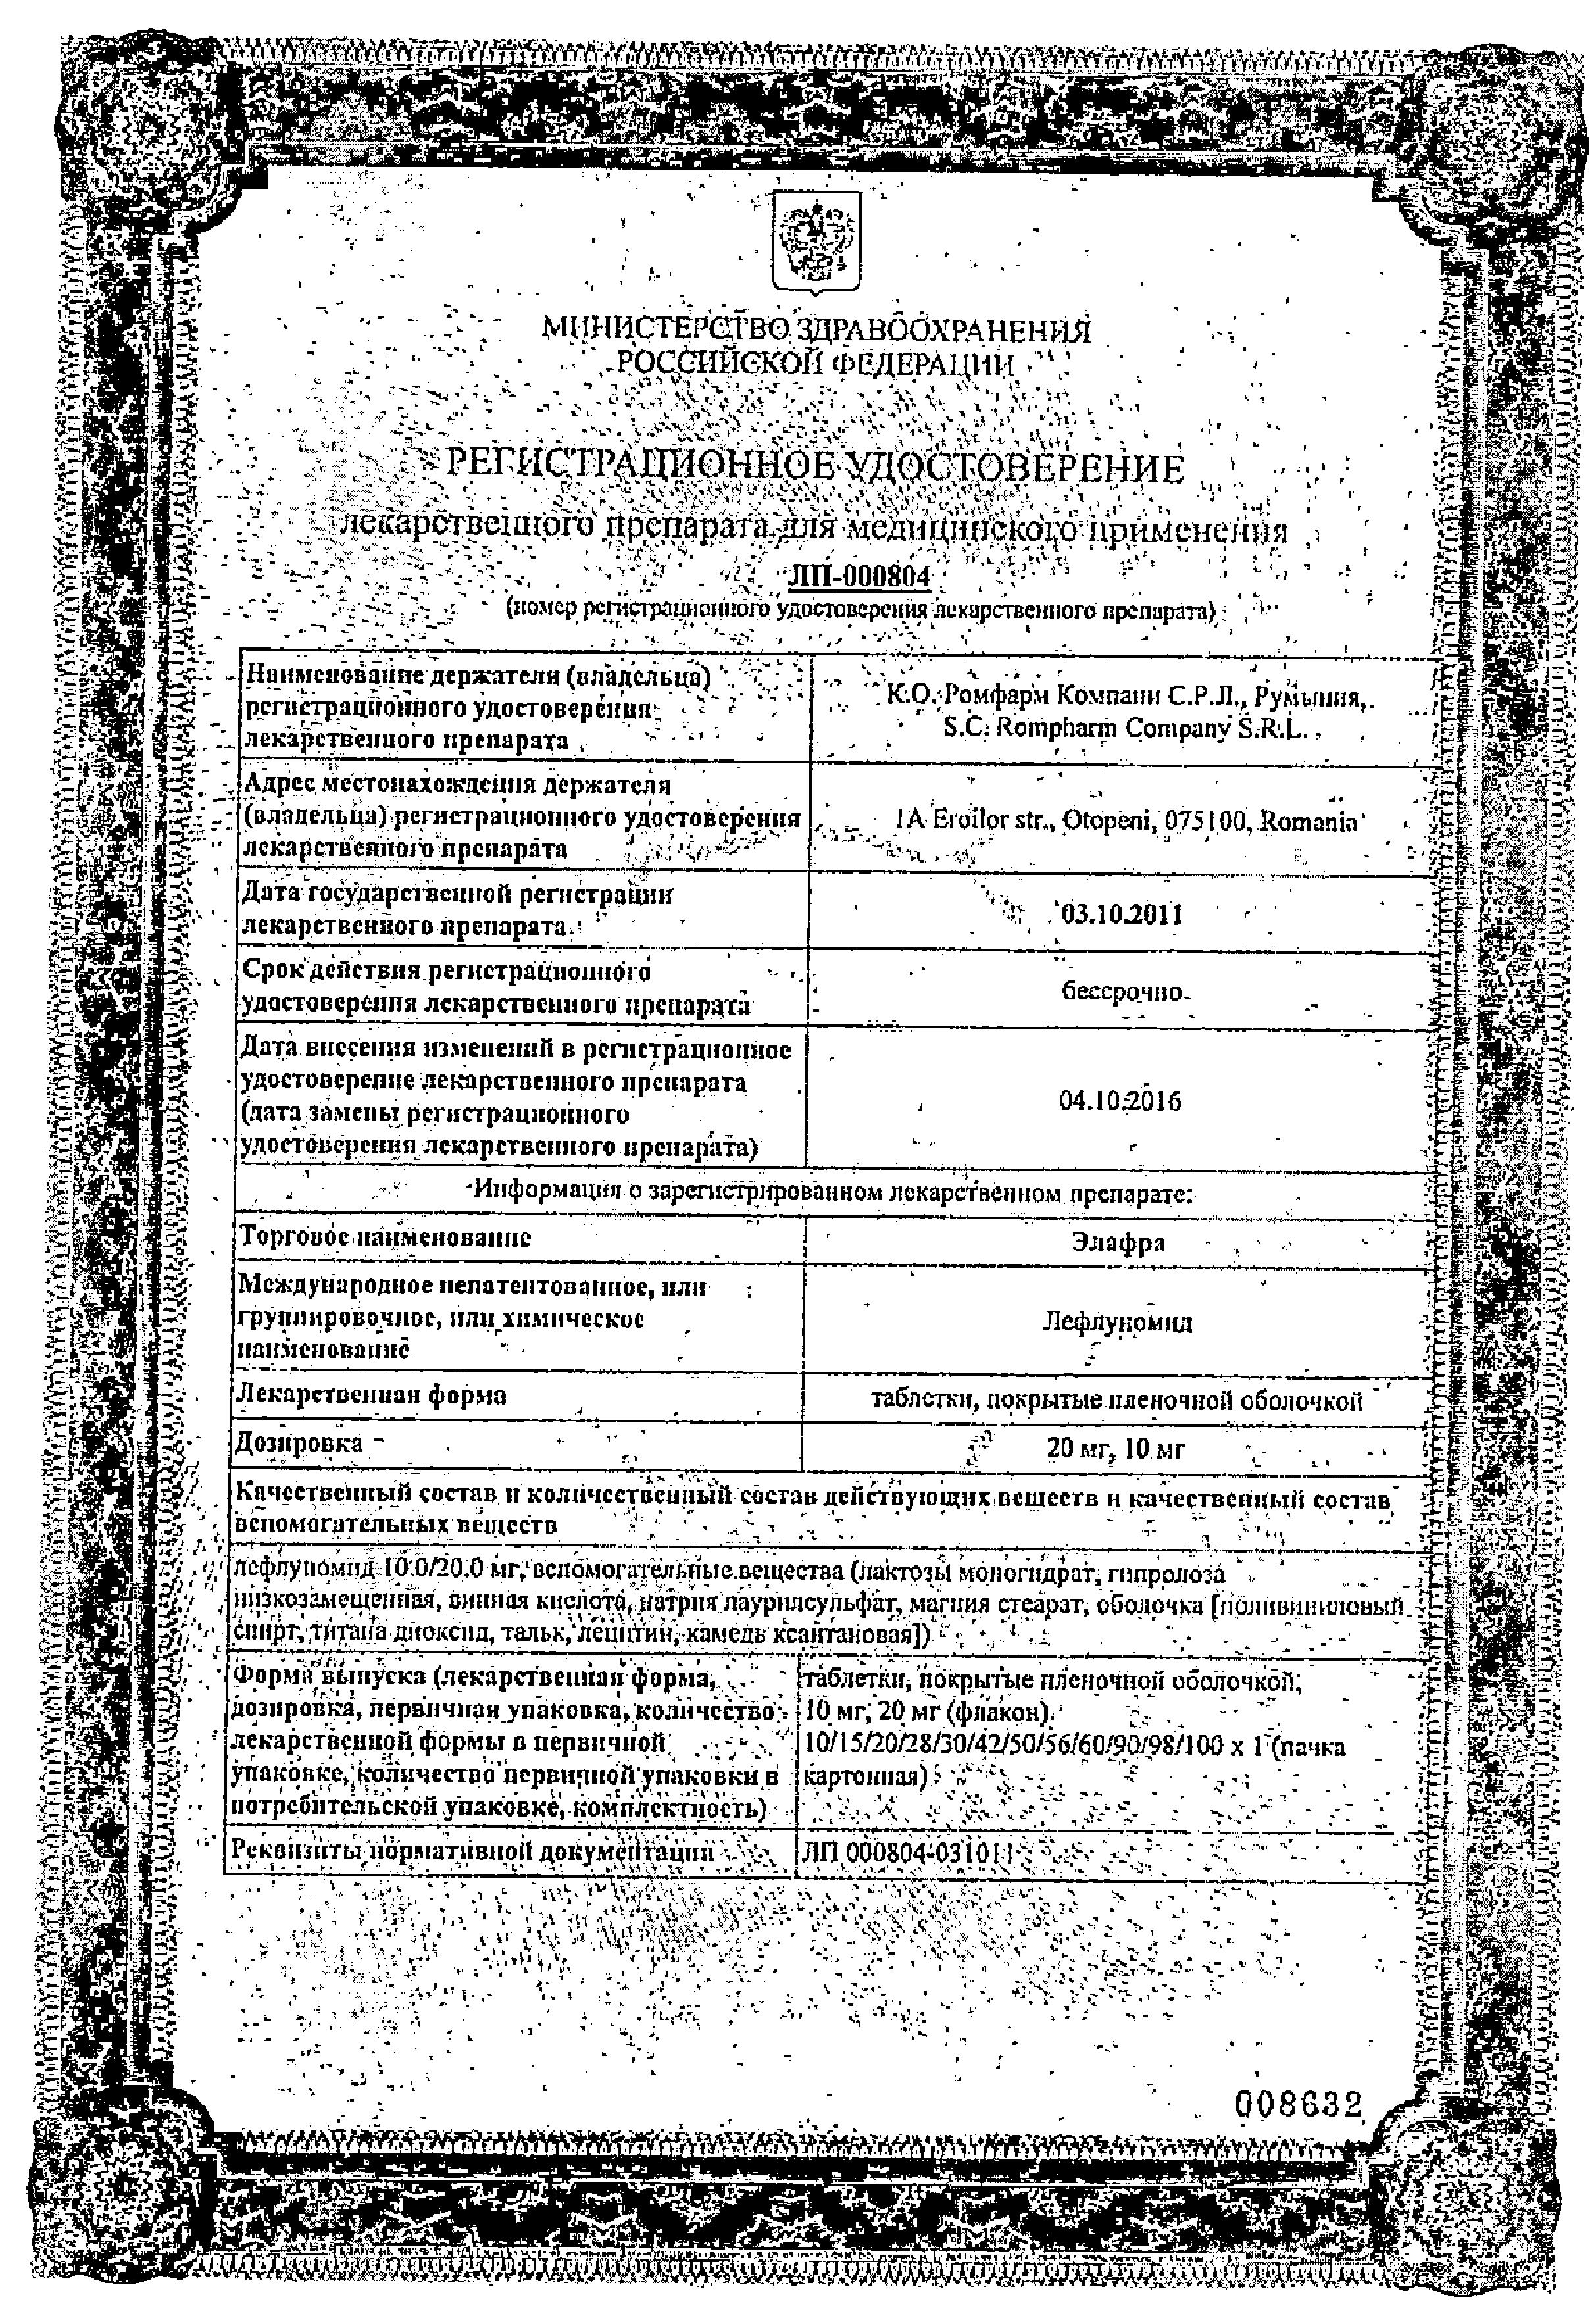 Элафра сертификат